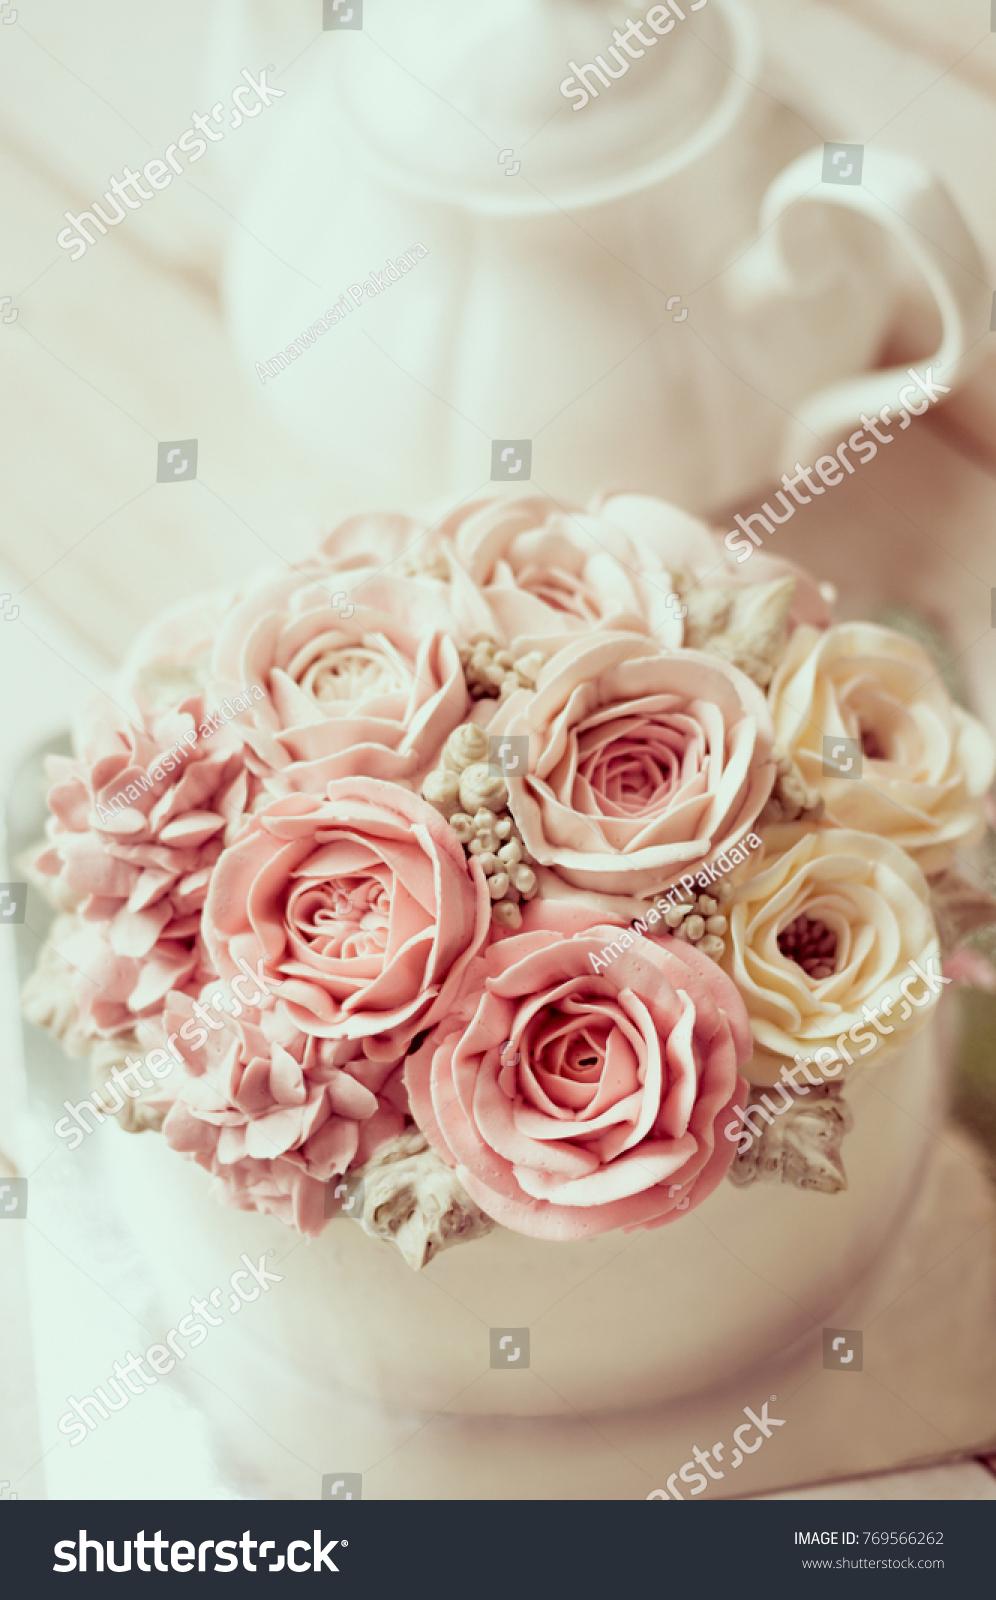 Buttercream Flower Cake Happy Birthday Cake Stock Photo (Royalty ...